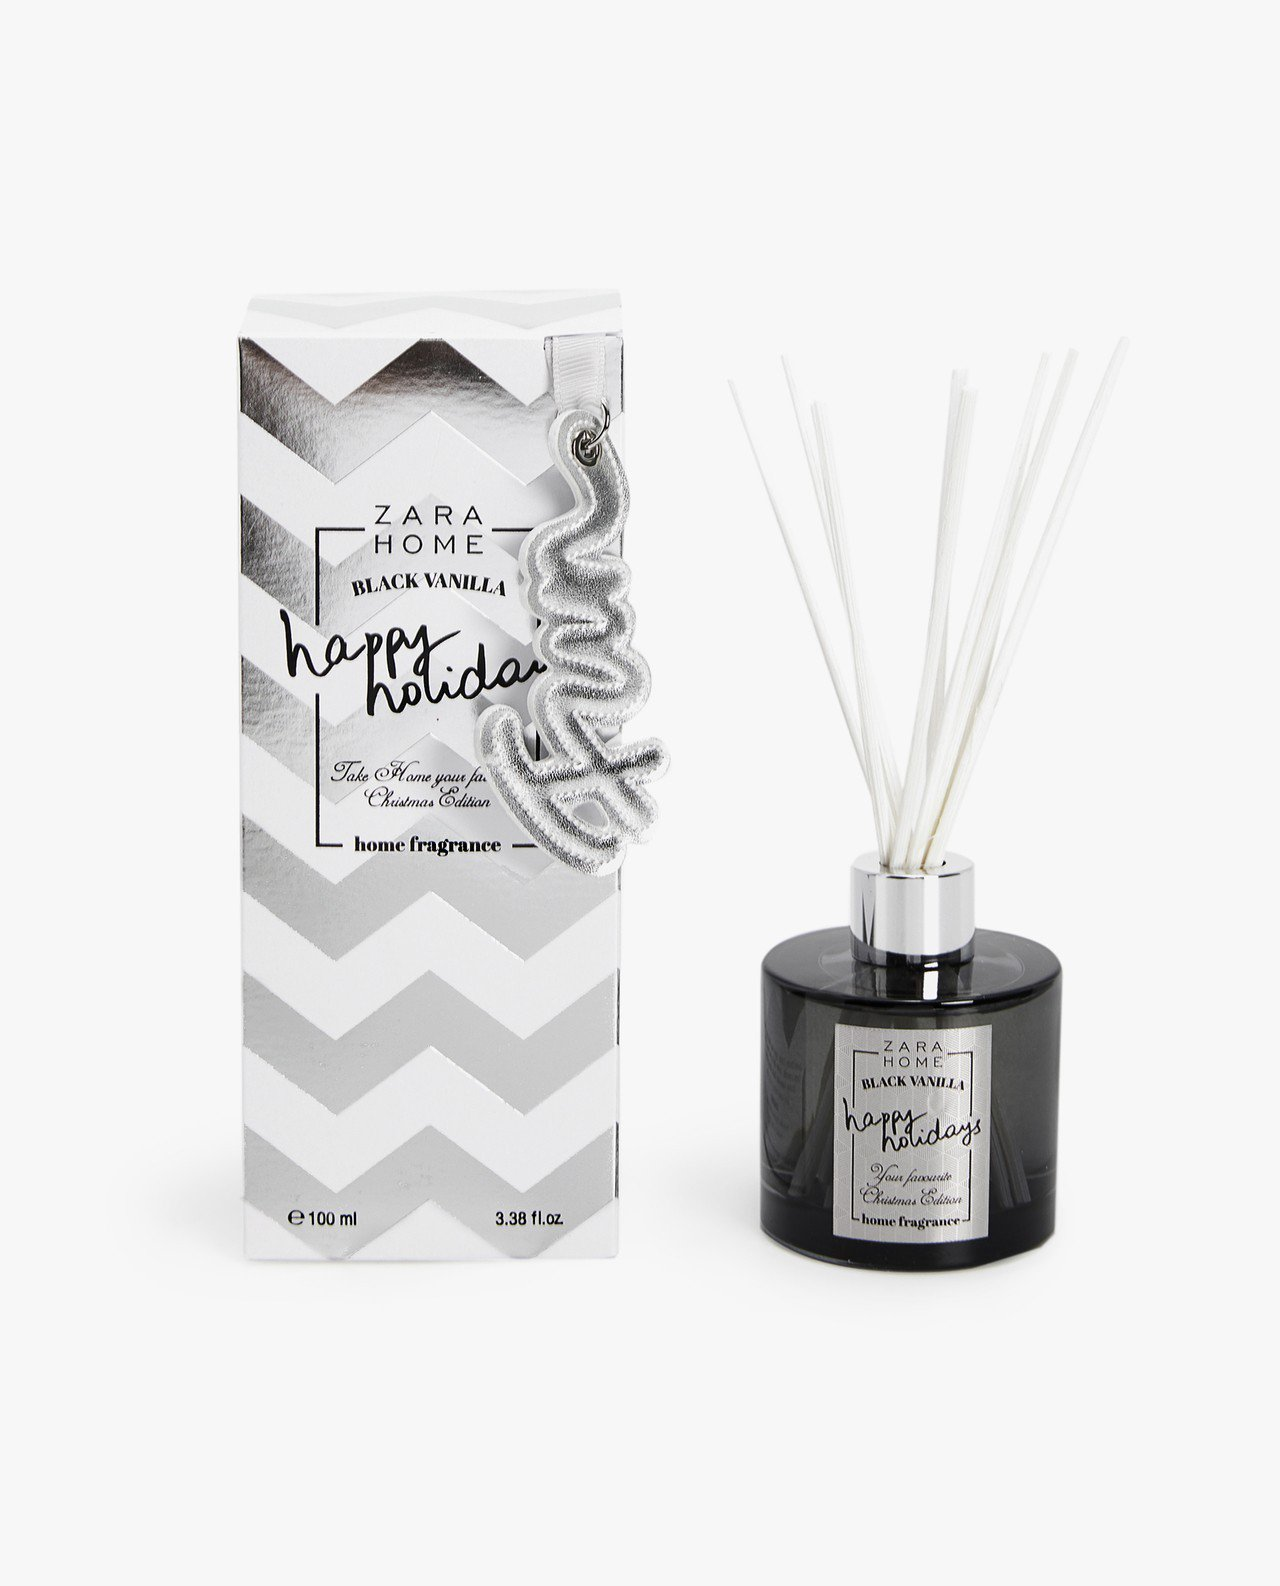 ZARA HOME耶誕香氣的銀灰款是冬季熱銷香氣Black Vanilla黑香草...